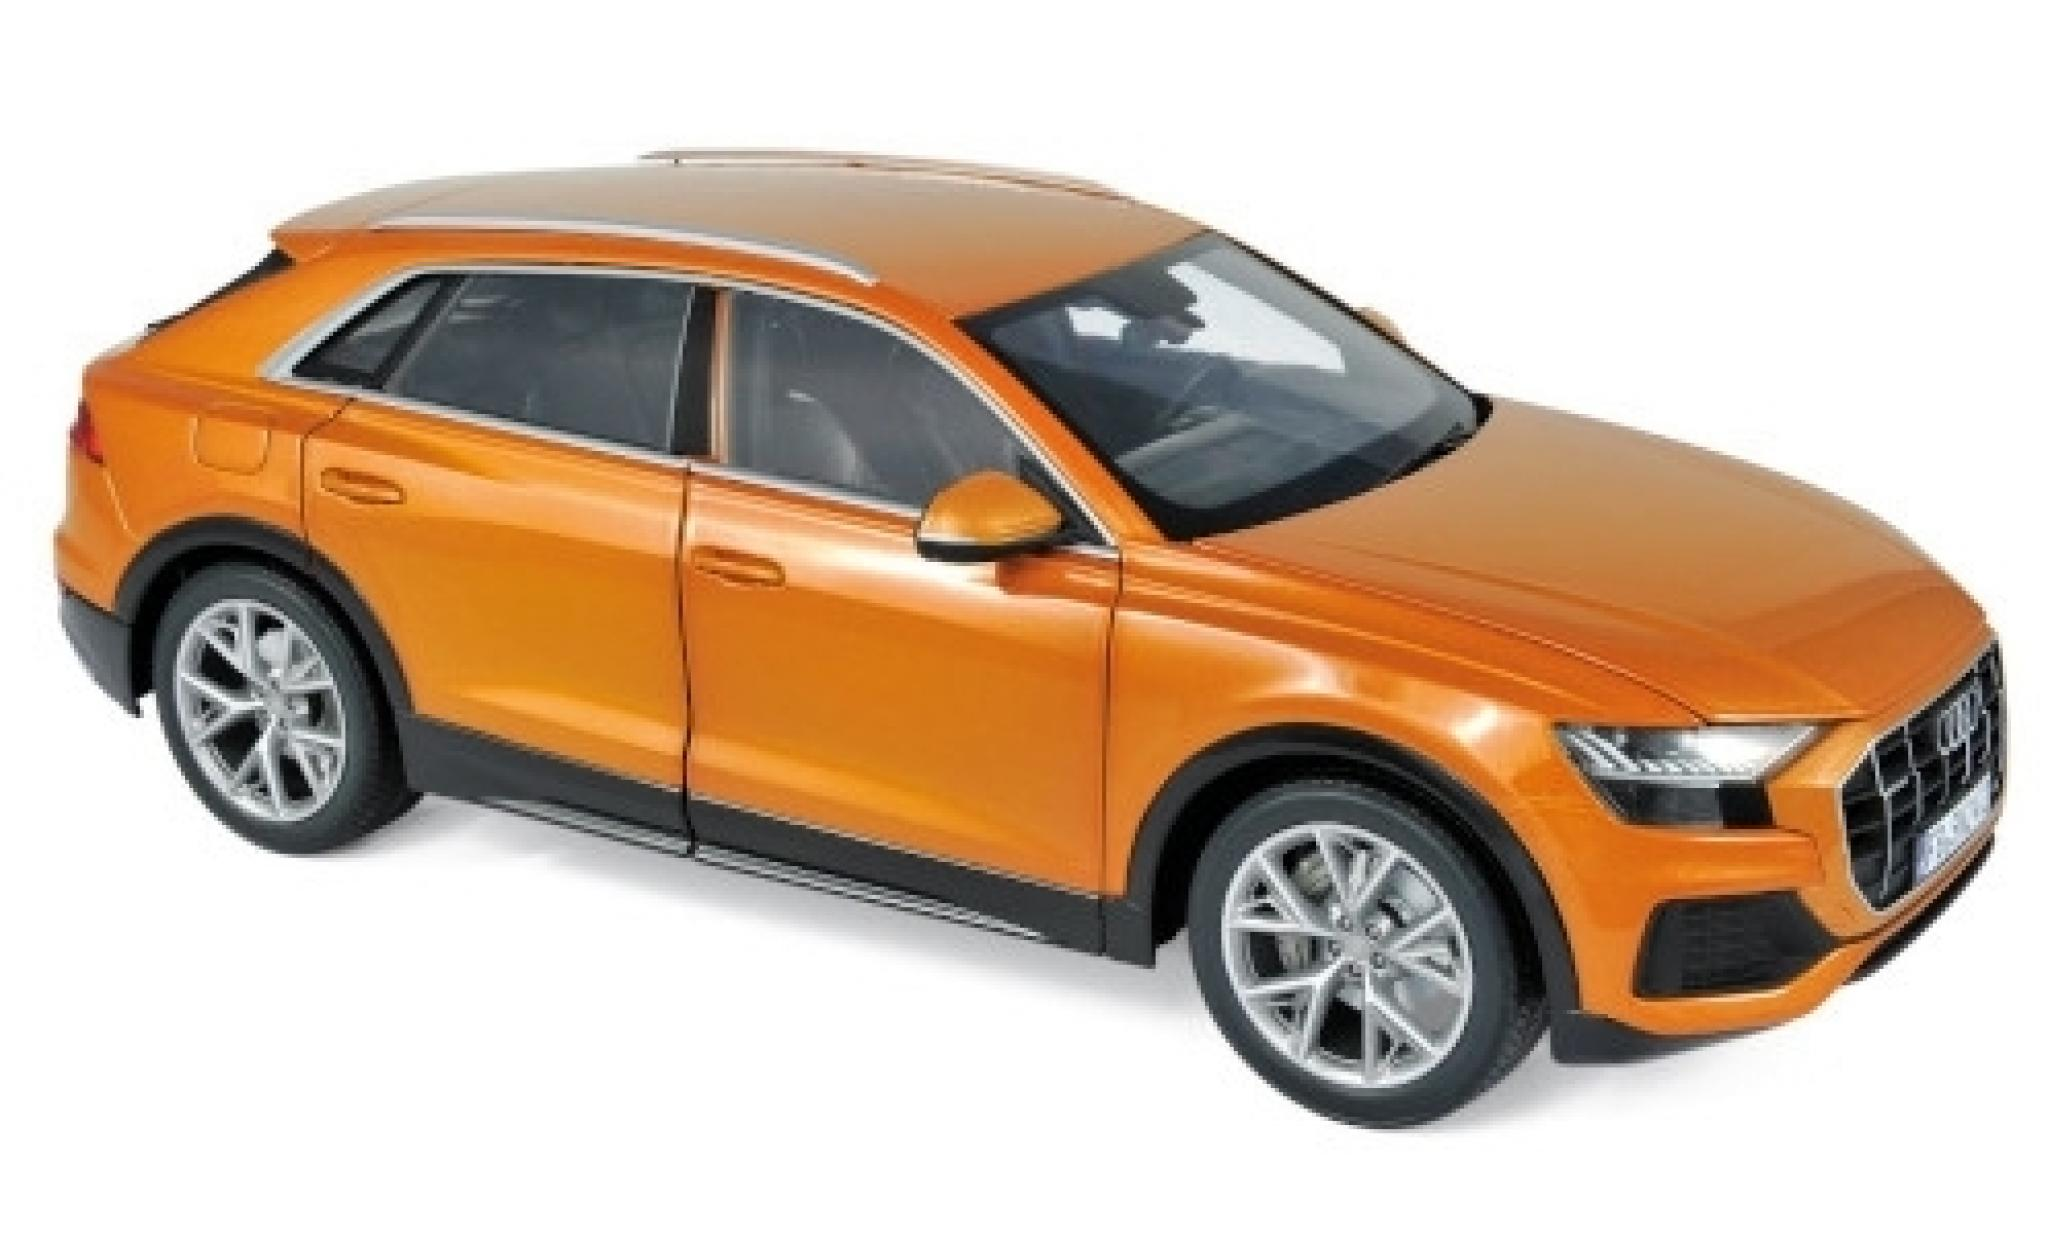 Audi Q8 1/18 Norev metallise orange 2018